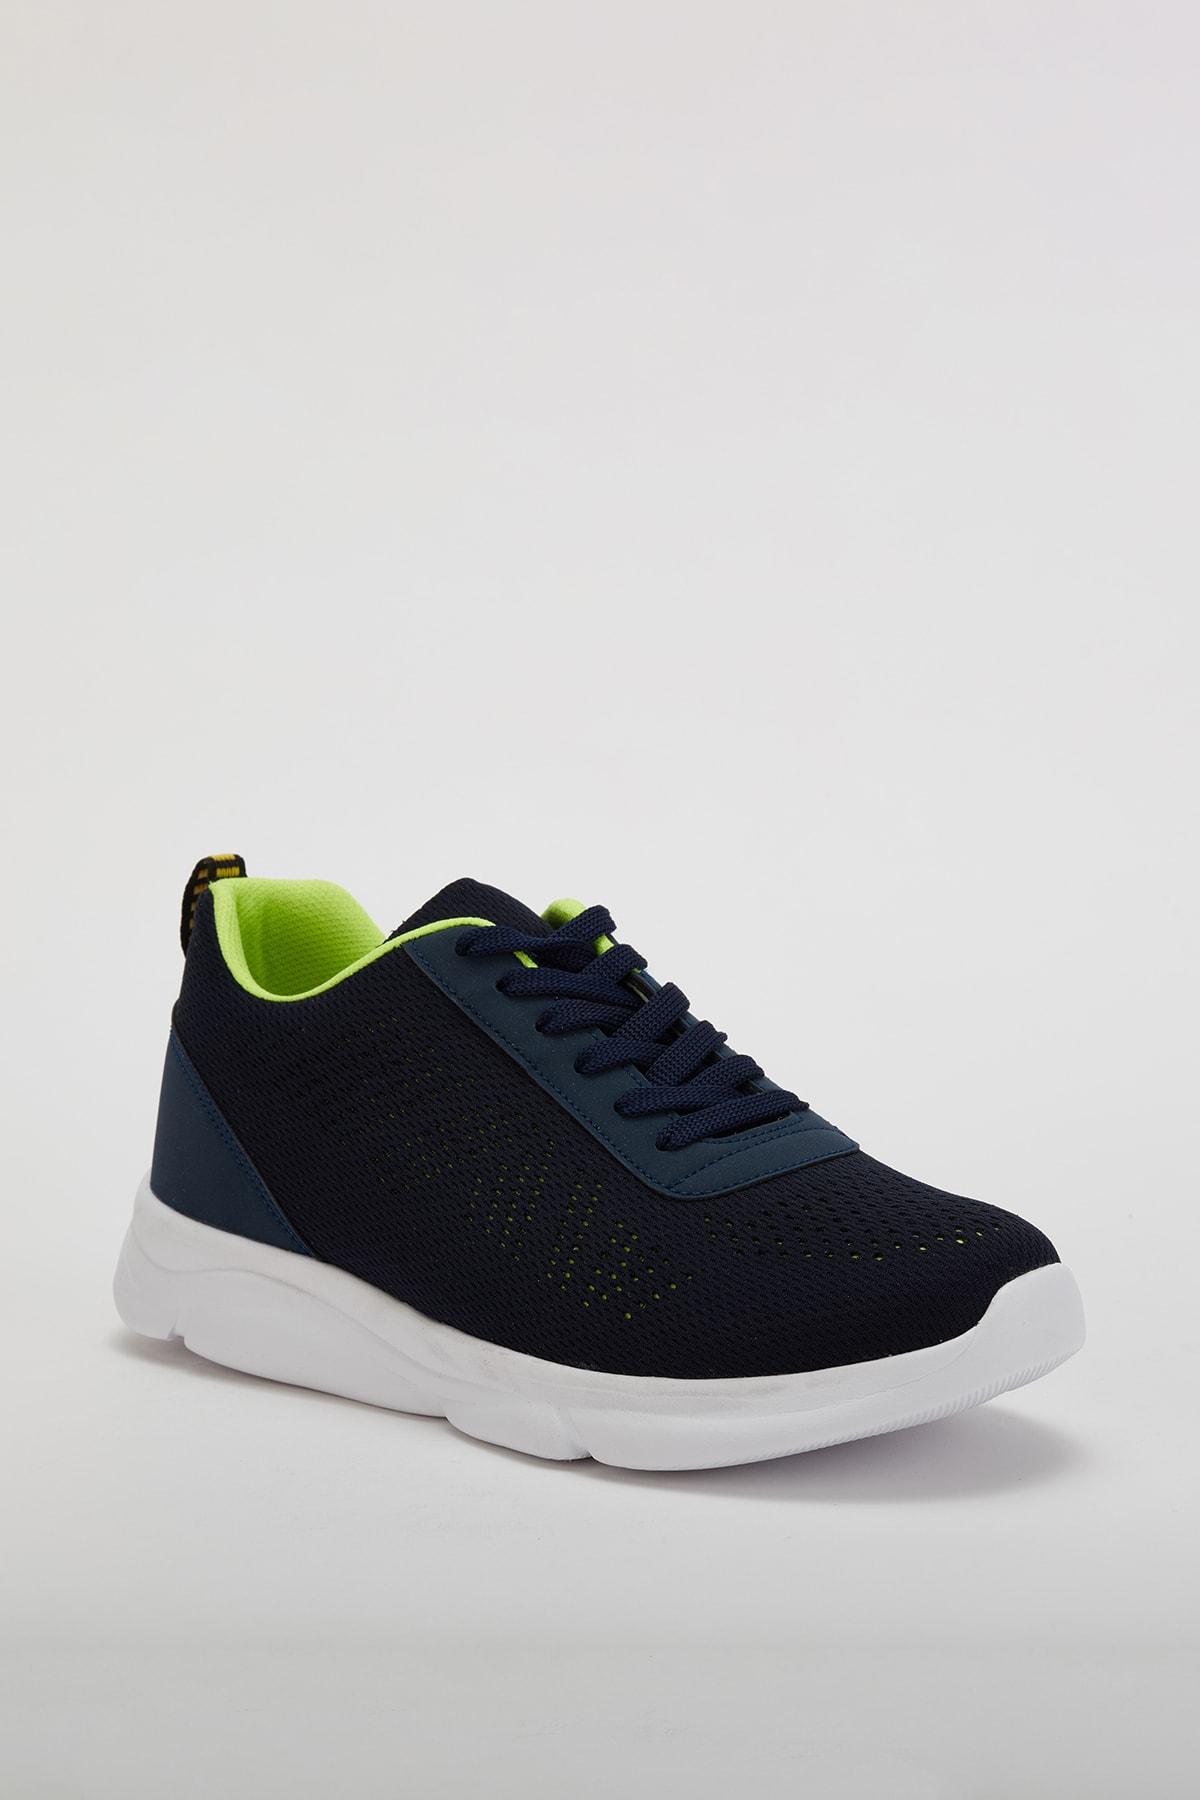 MUGGO Unisex Sneakers Ayakkabı 2